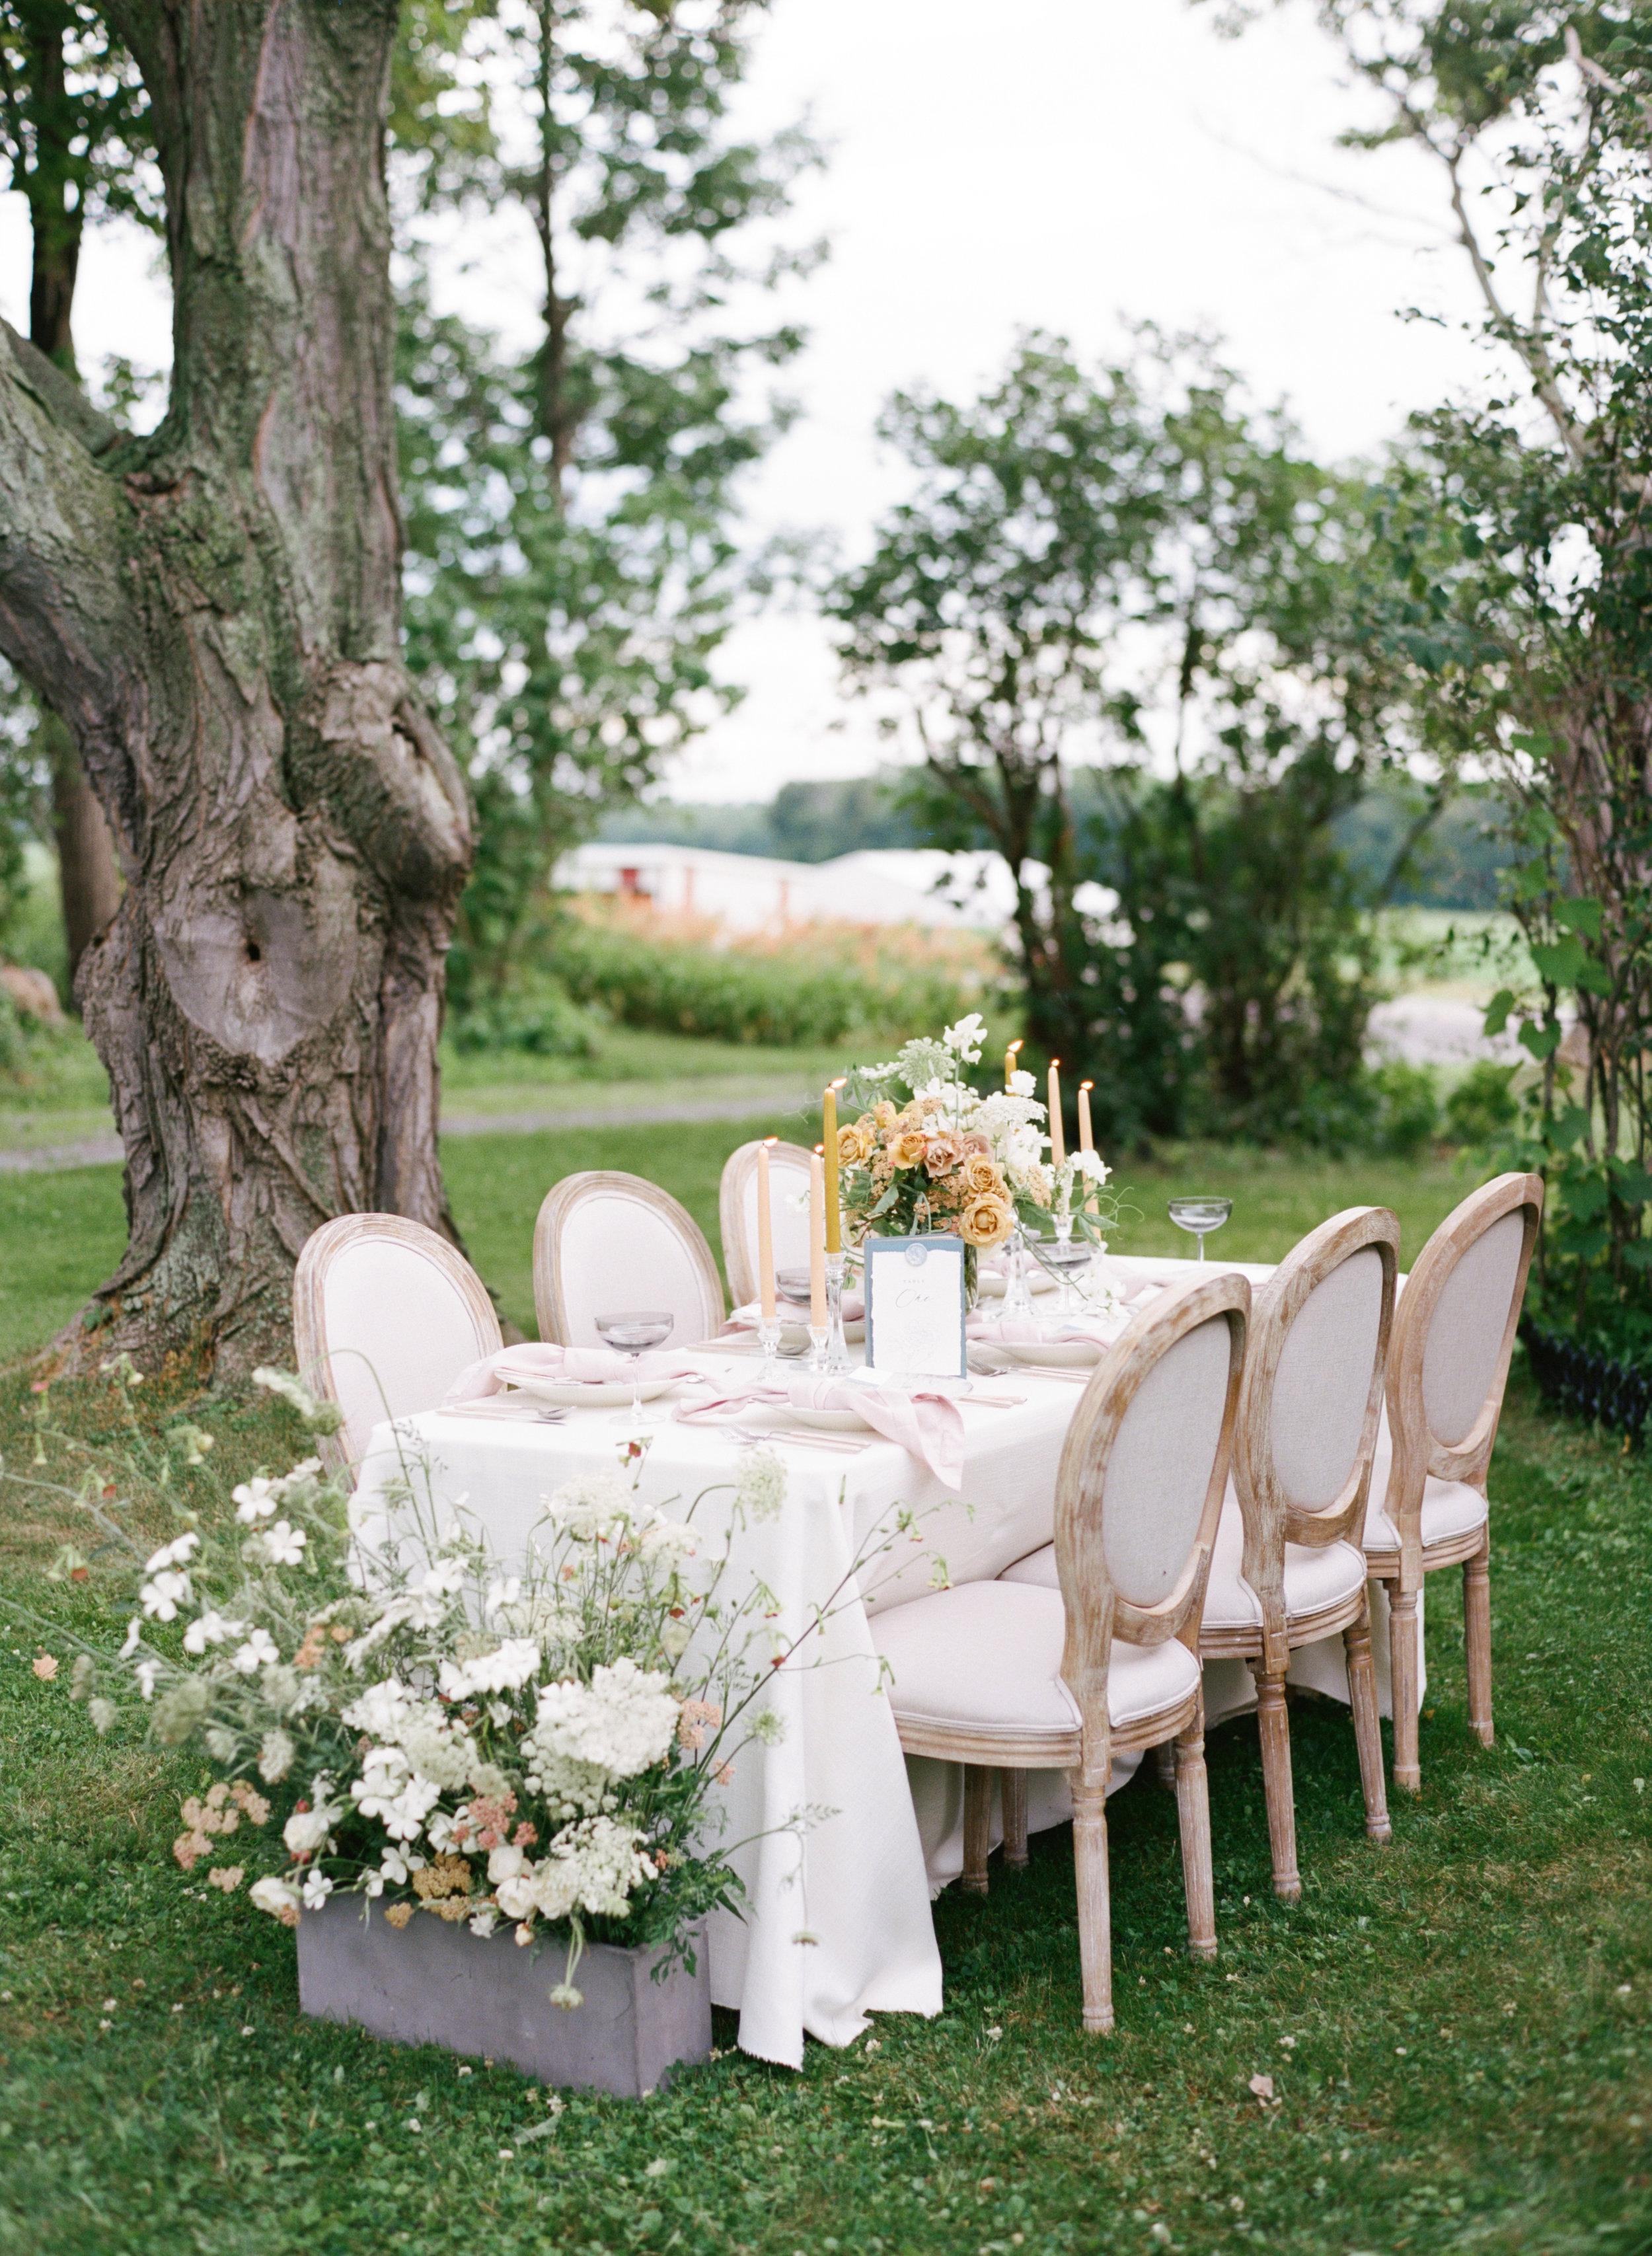 alexandra-meseke-understated-soft-luxury-wedding-upstate-ny_0124.jpg